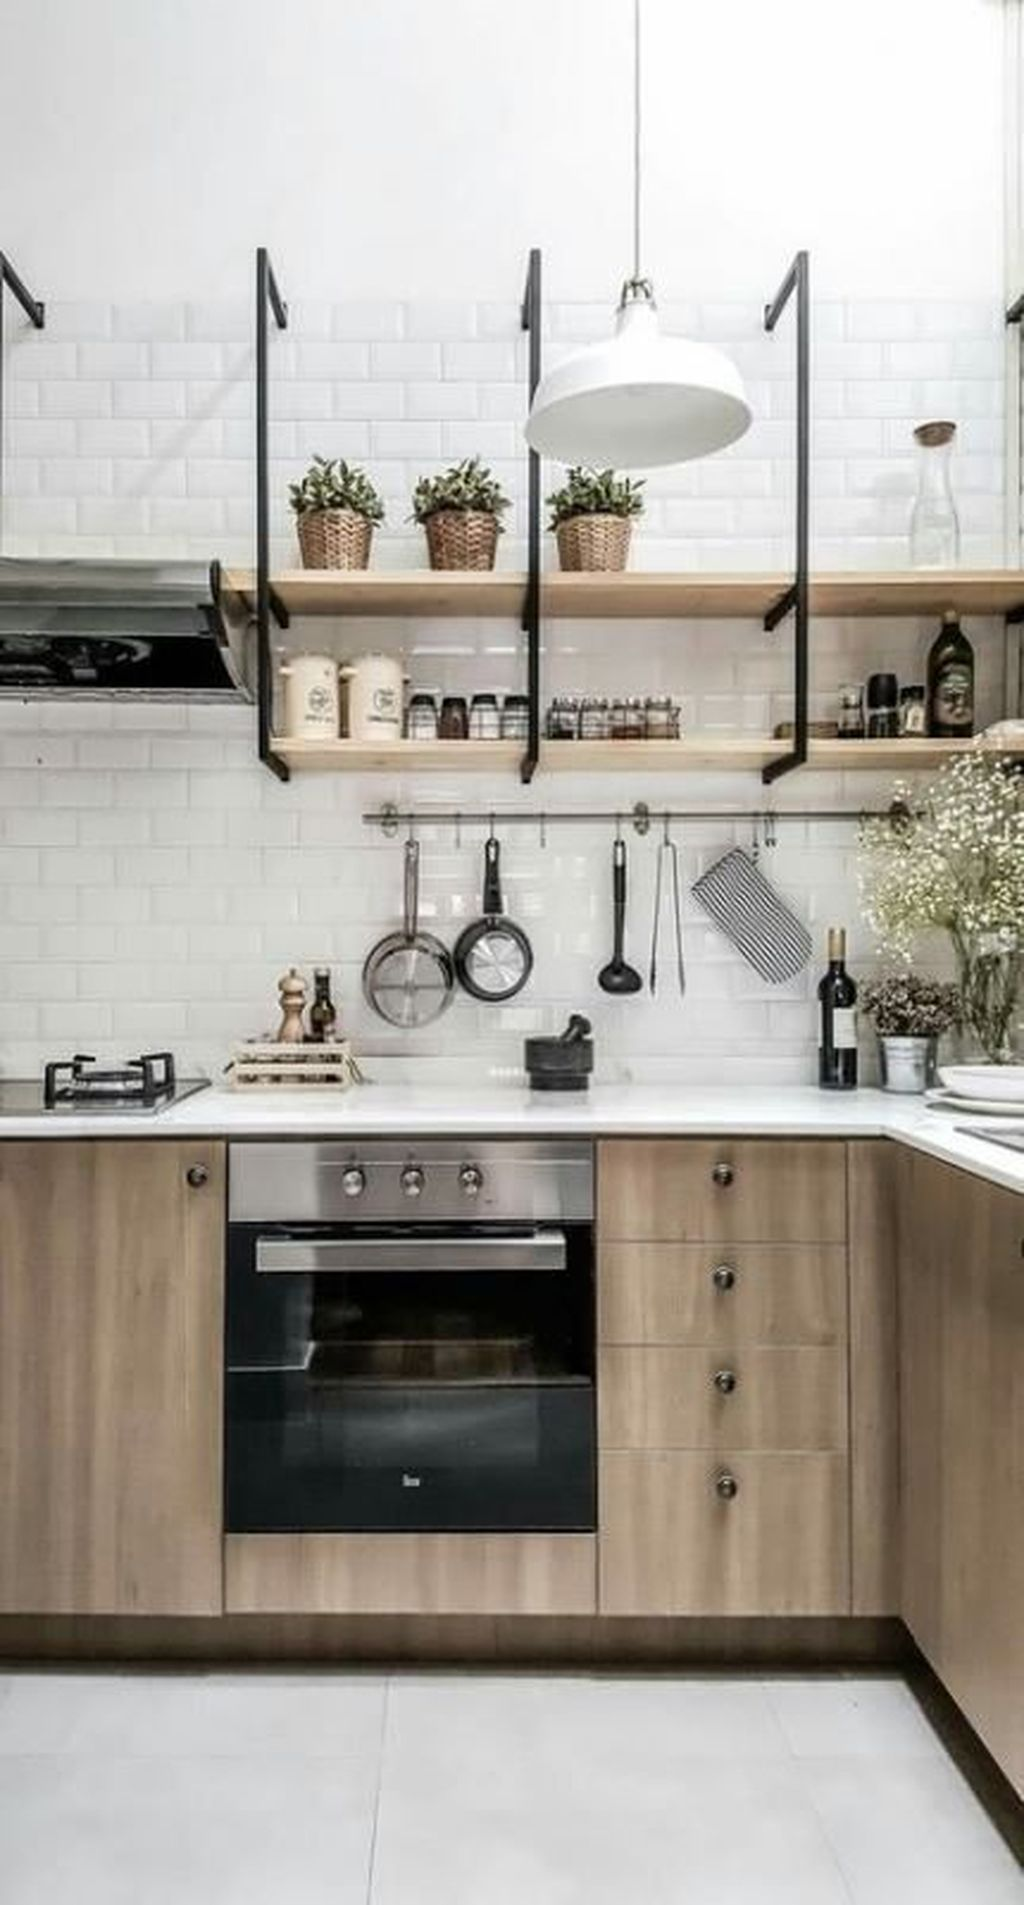 39 Rustic Apartment Kitchen Design Ideas To Try Asap Loft